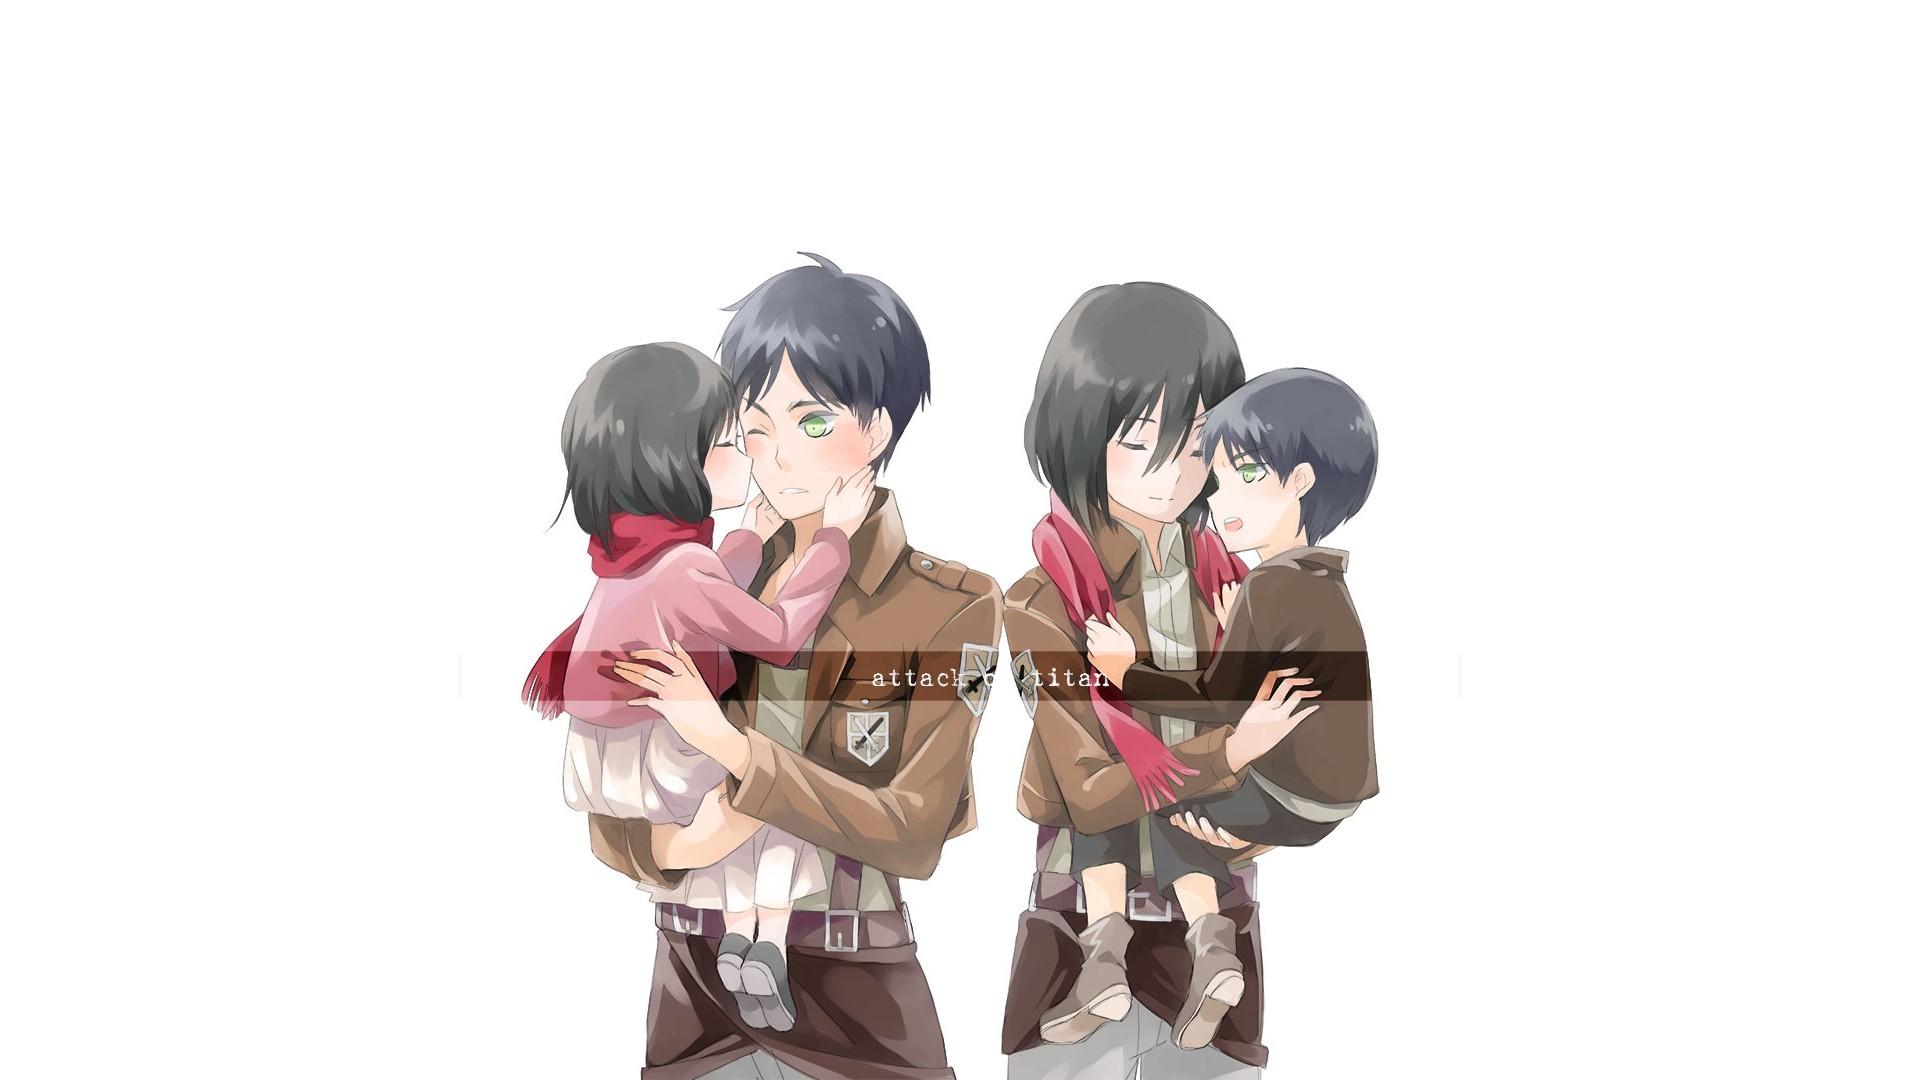 Wallpaper Illustration Anime Cartoon Shingeki No Kyojin Eren Jeager Mikasa Ackerman Toy Figurine Mangaka 1920x1080 Bjuandy 82415 Hd Wallpapers Wallhere